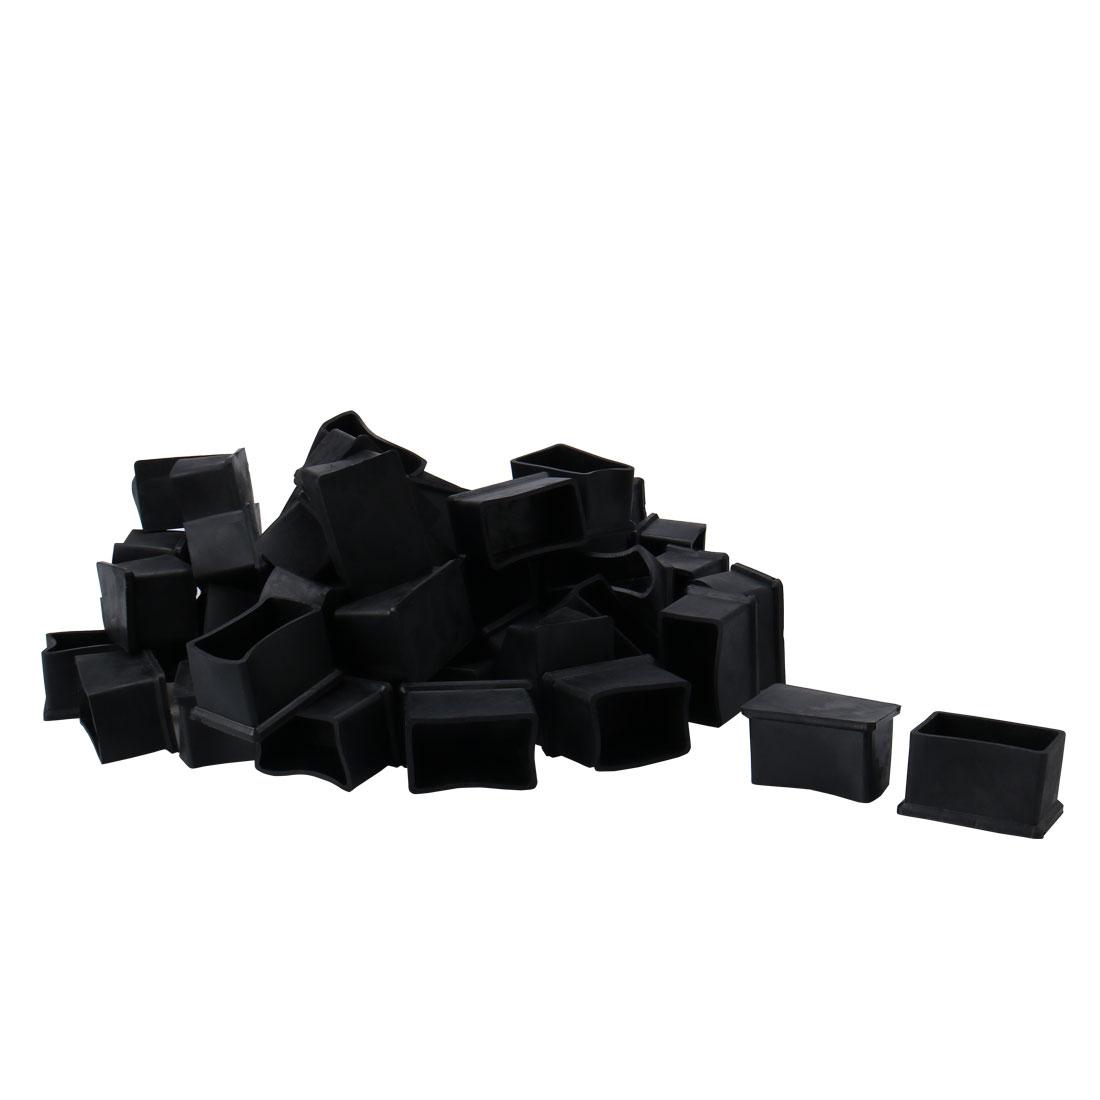 "Cabinet Leg Caps End Tip Home Furniture Protector 50pcs 1.18"" x 2""(30 x 50mm)"